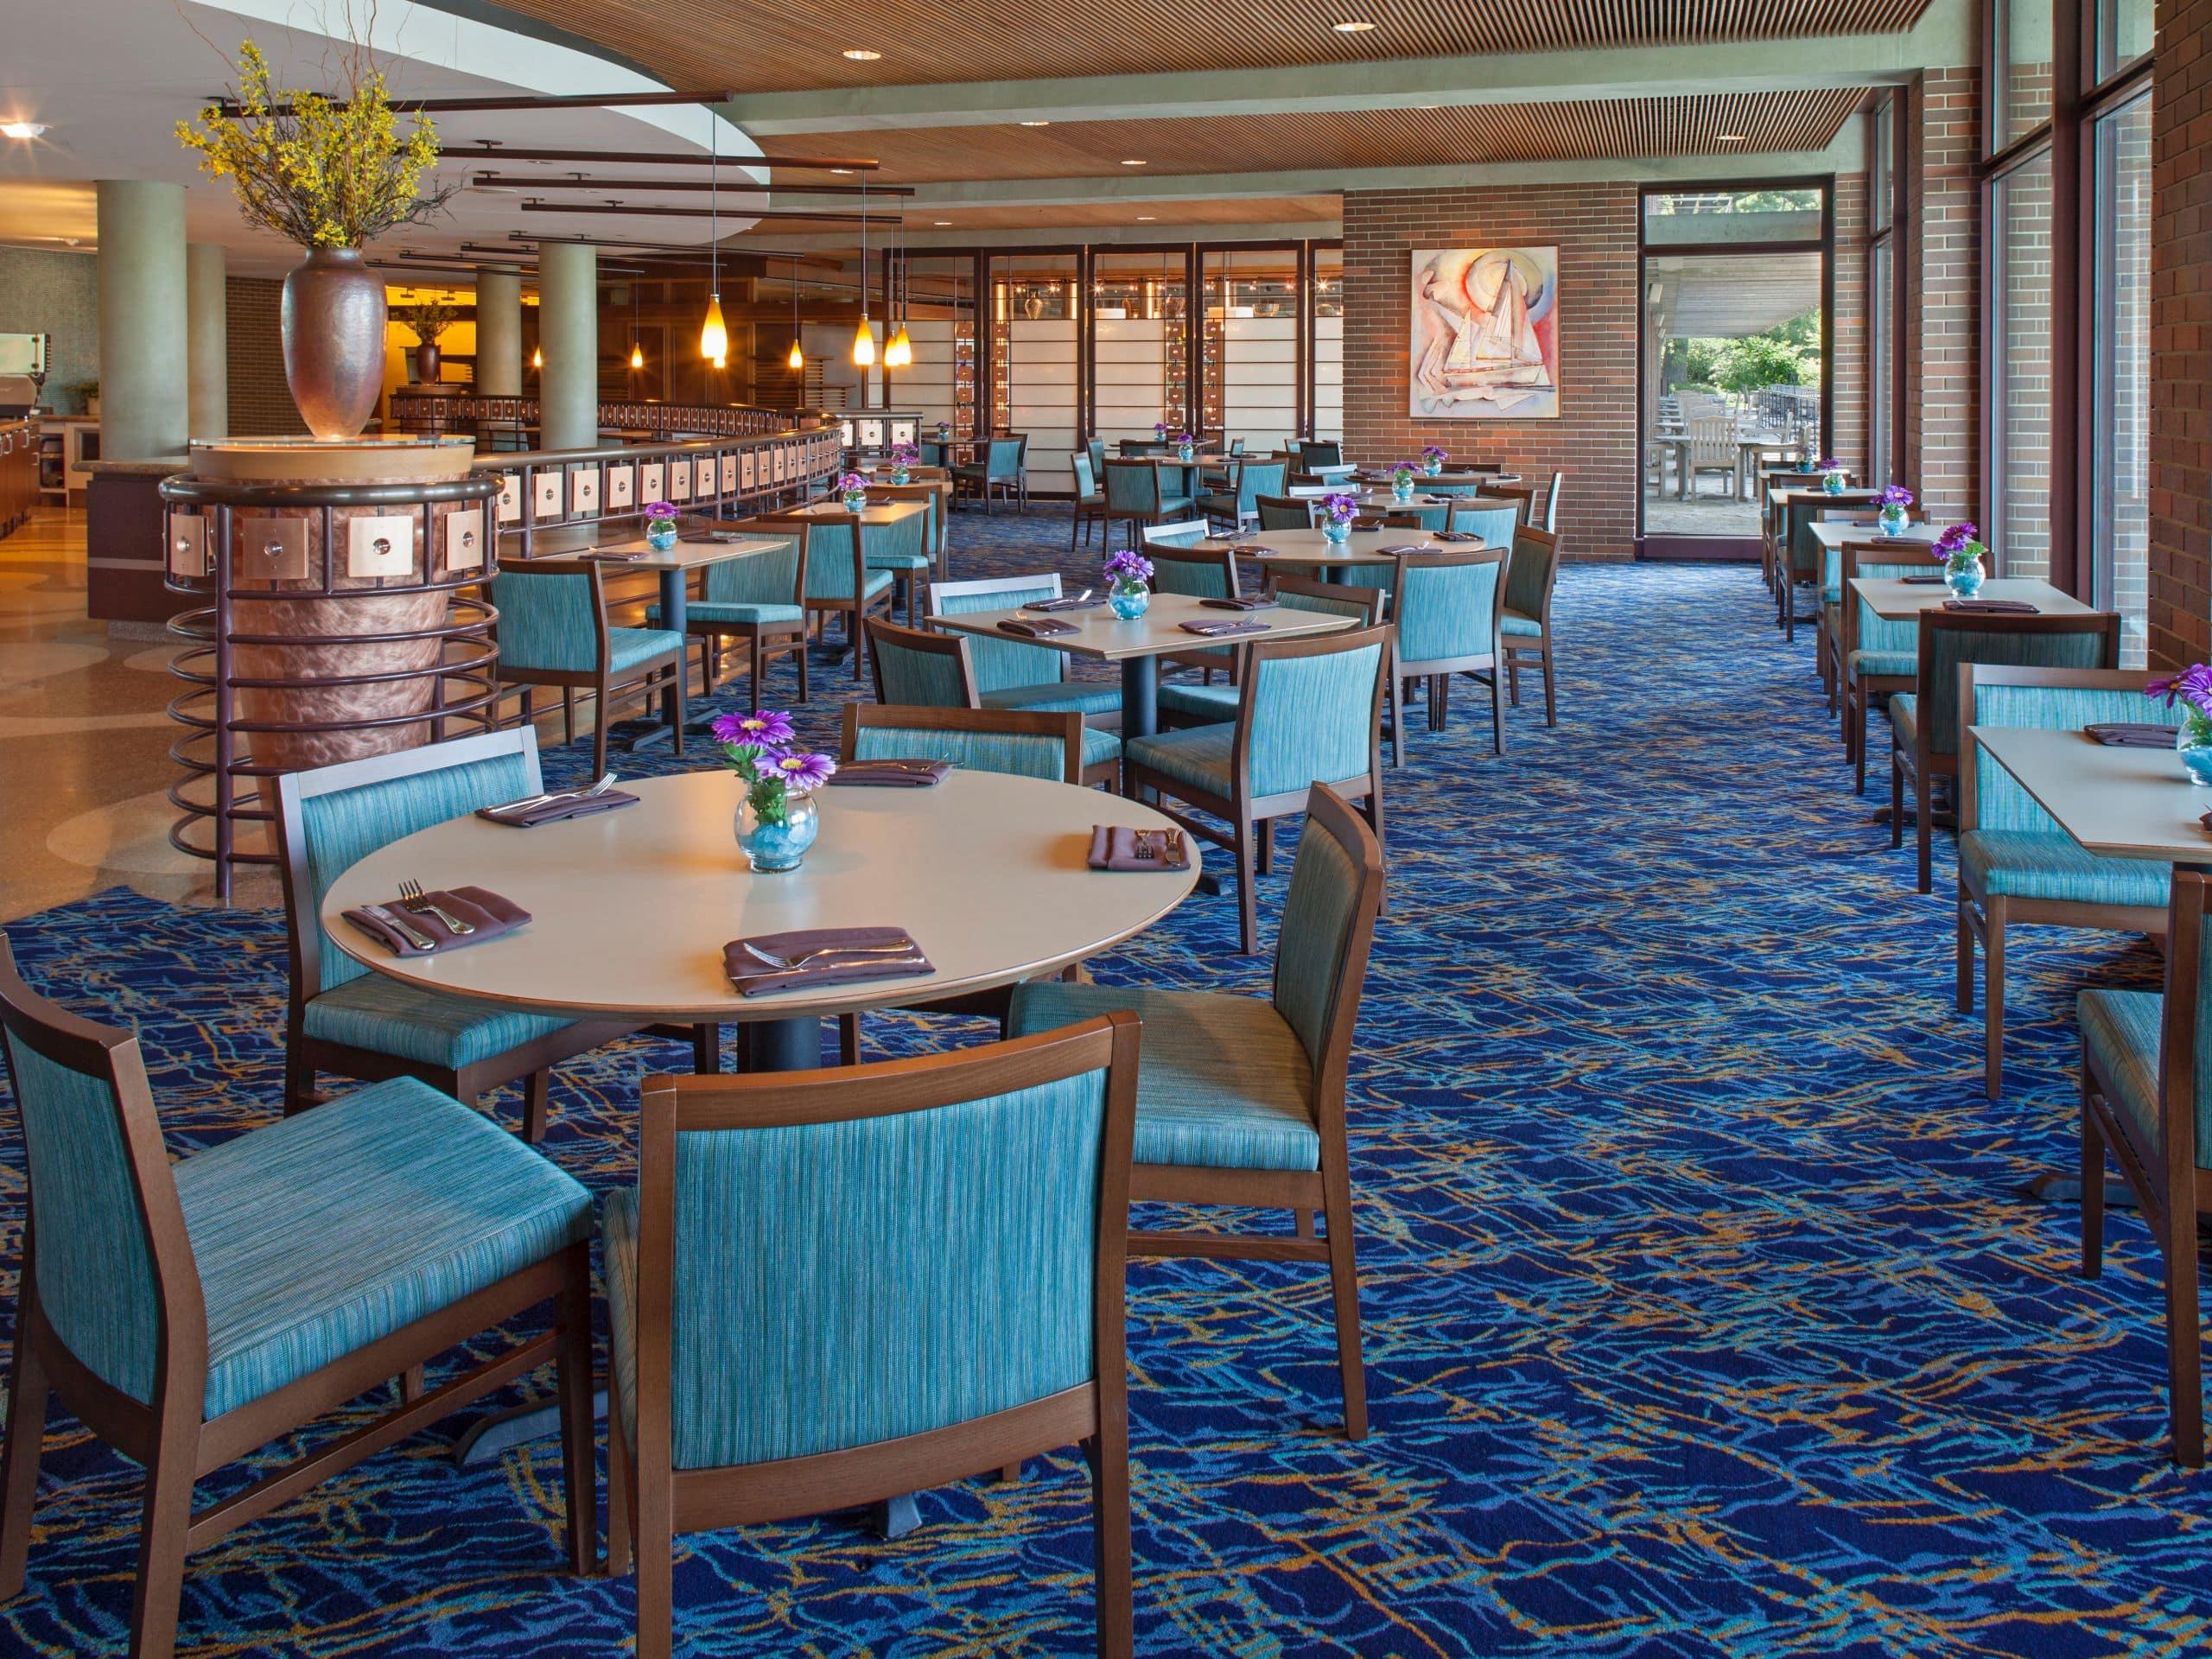 Oak Brook Resort | Hyatt Lodge at McDonald\'s Campus